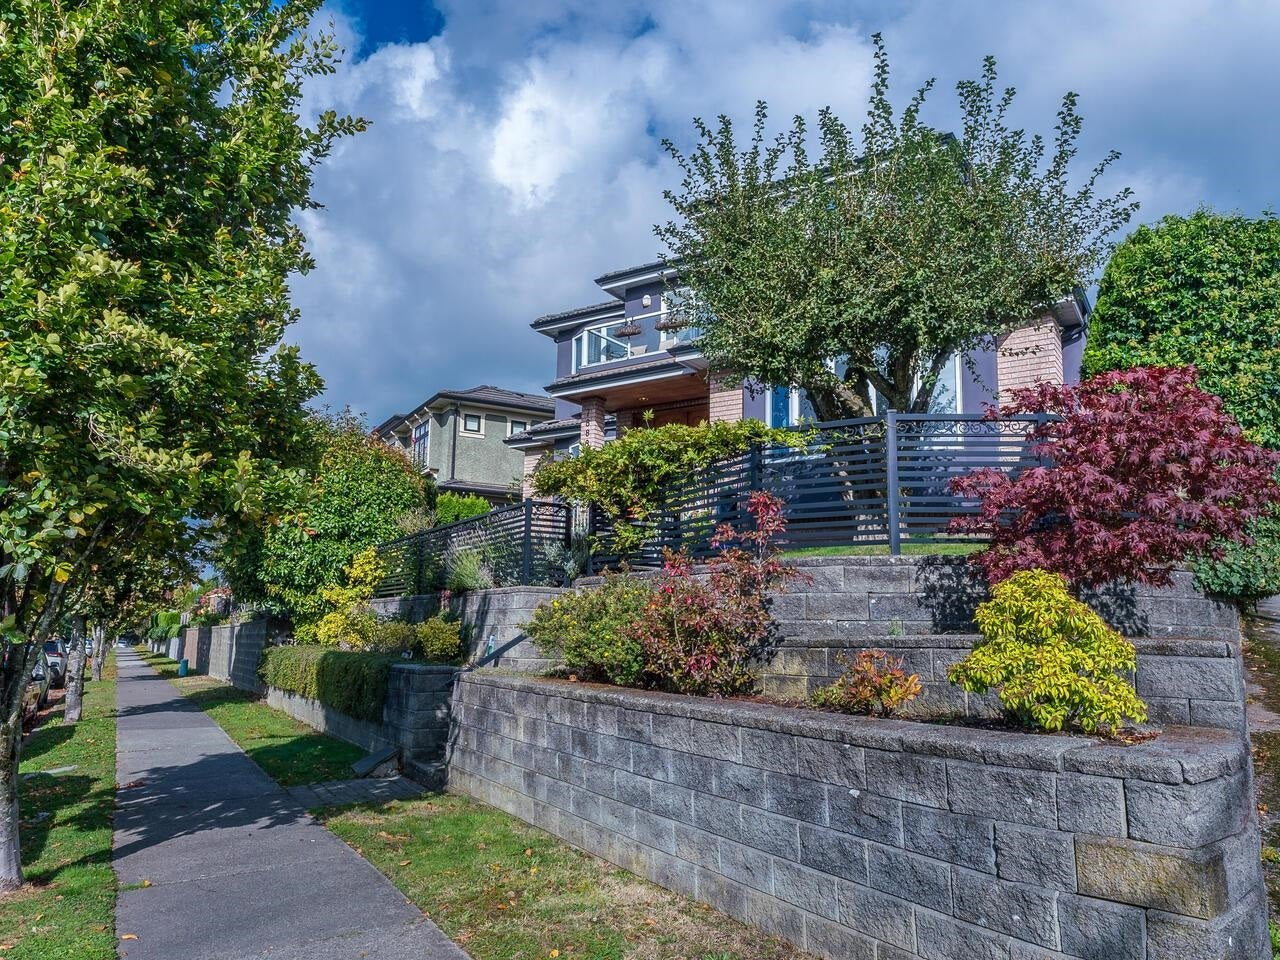 7888 JASPER CRESCENT - Fraserview VE House/Single Family for sale, 7 Bedrooms (R2622945) - #25